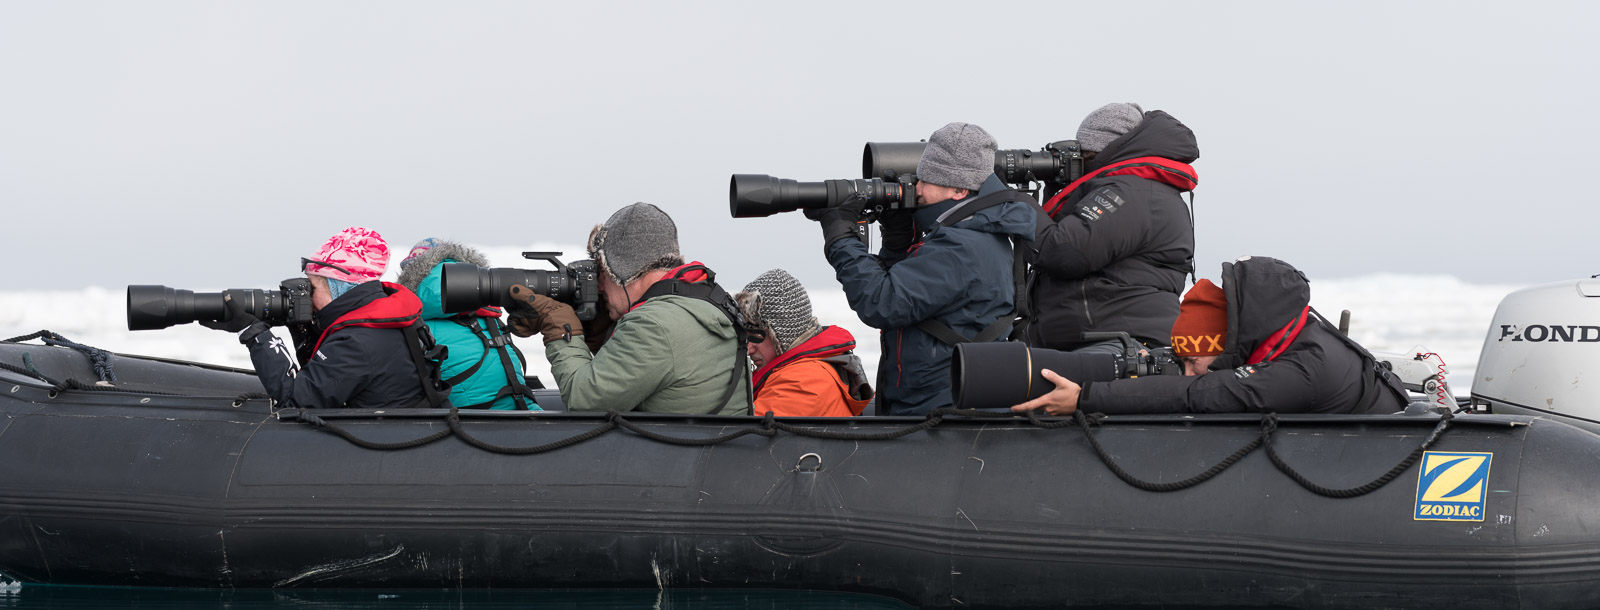 photo-workshop-svalbard-photo-expedition-4.jpg